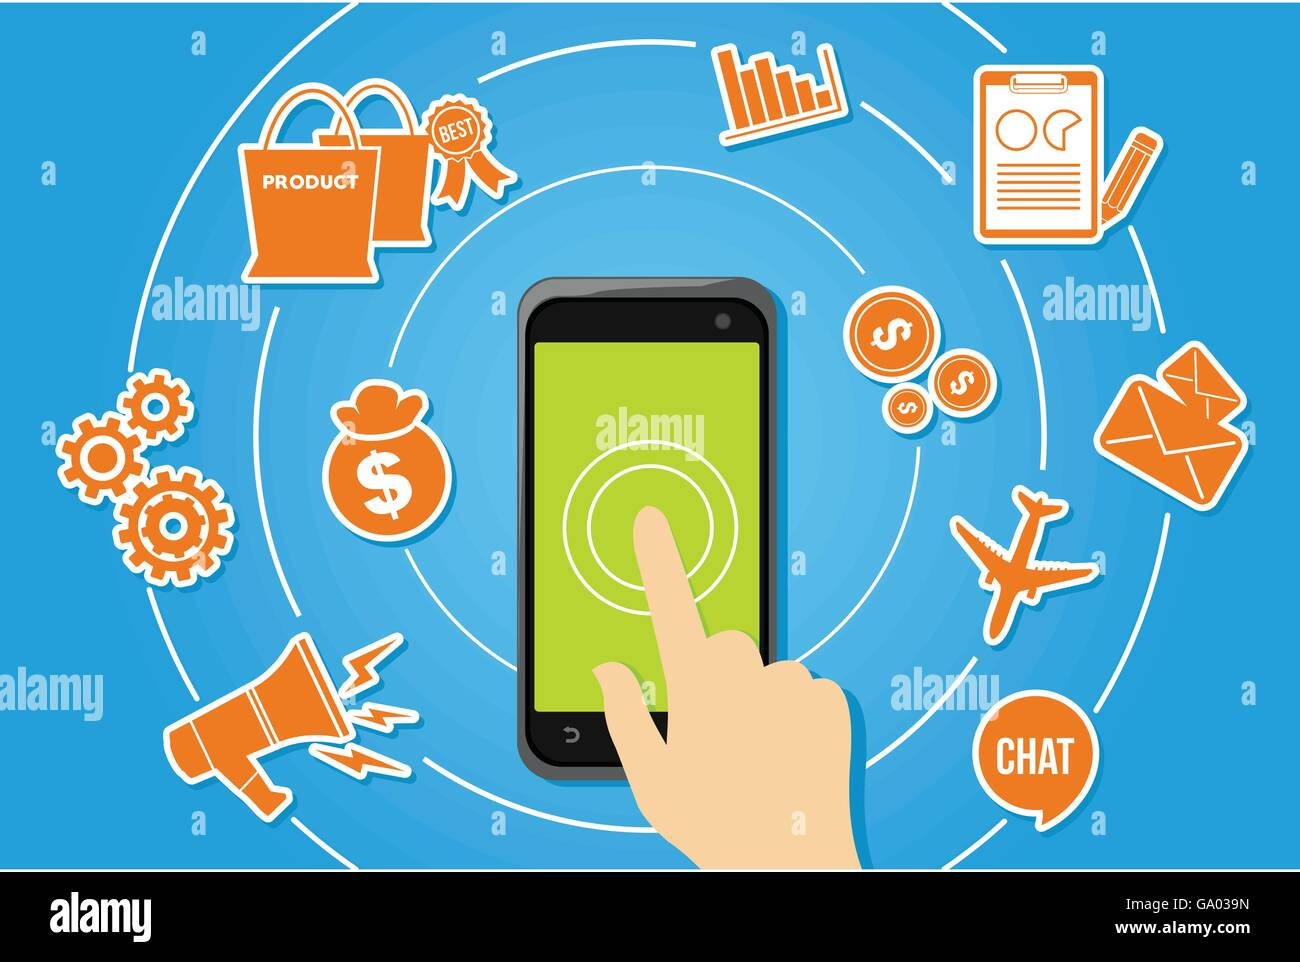 apps mobile application development ecosystem concept illustration - Stock Image